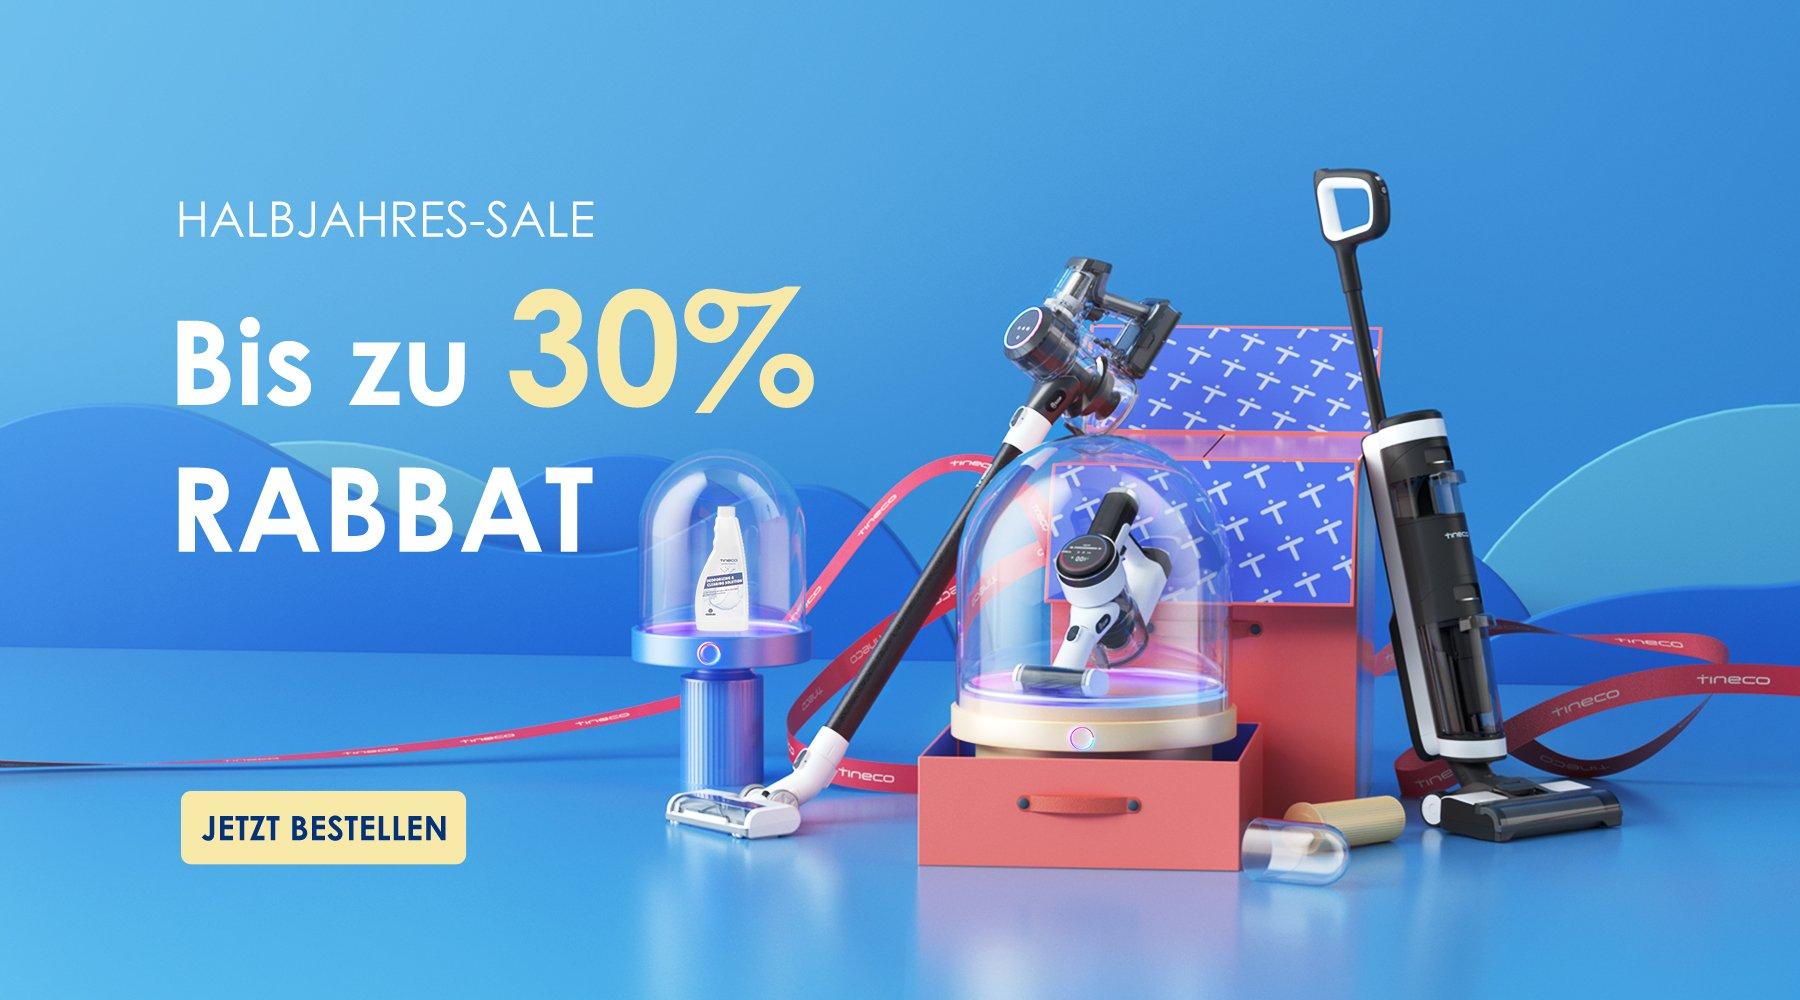 Tineco 30 % Rabatt - Halbjahres Sale!